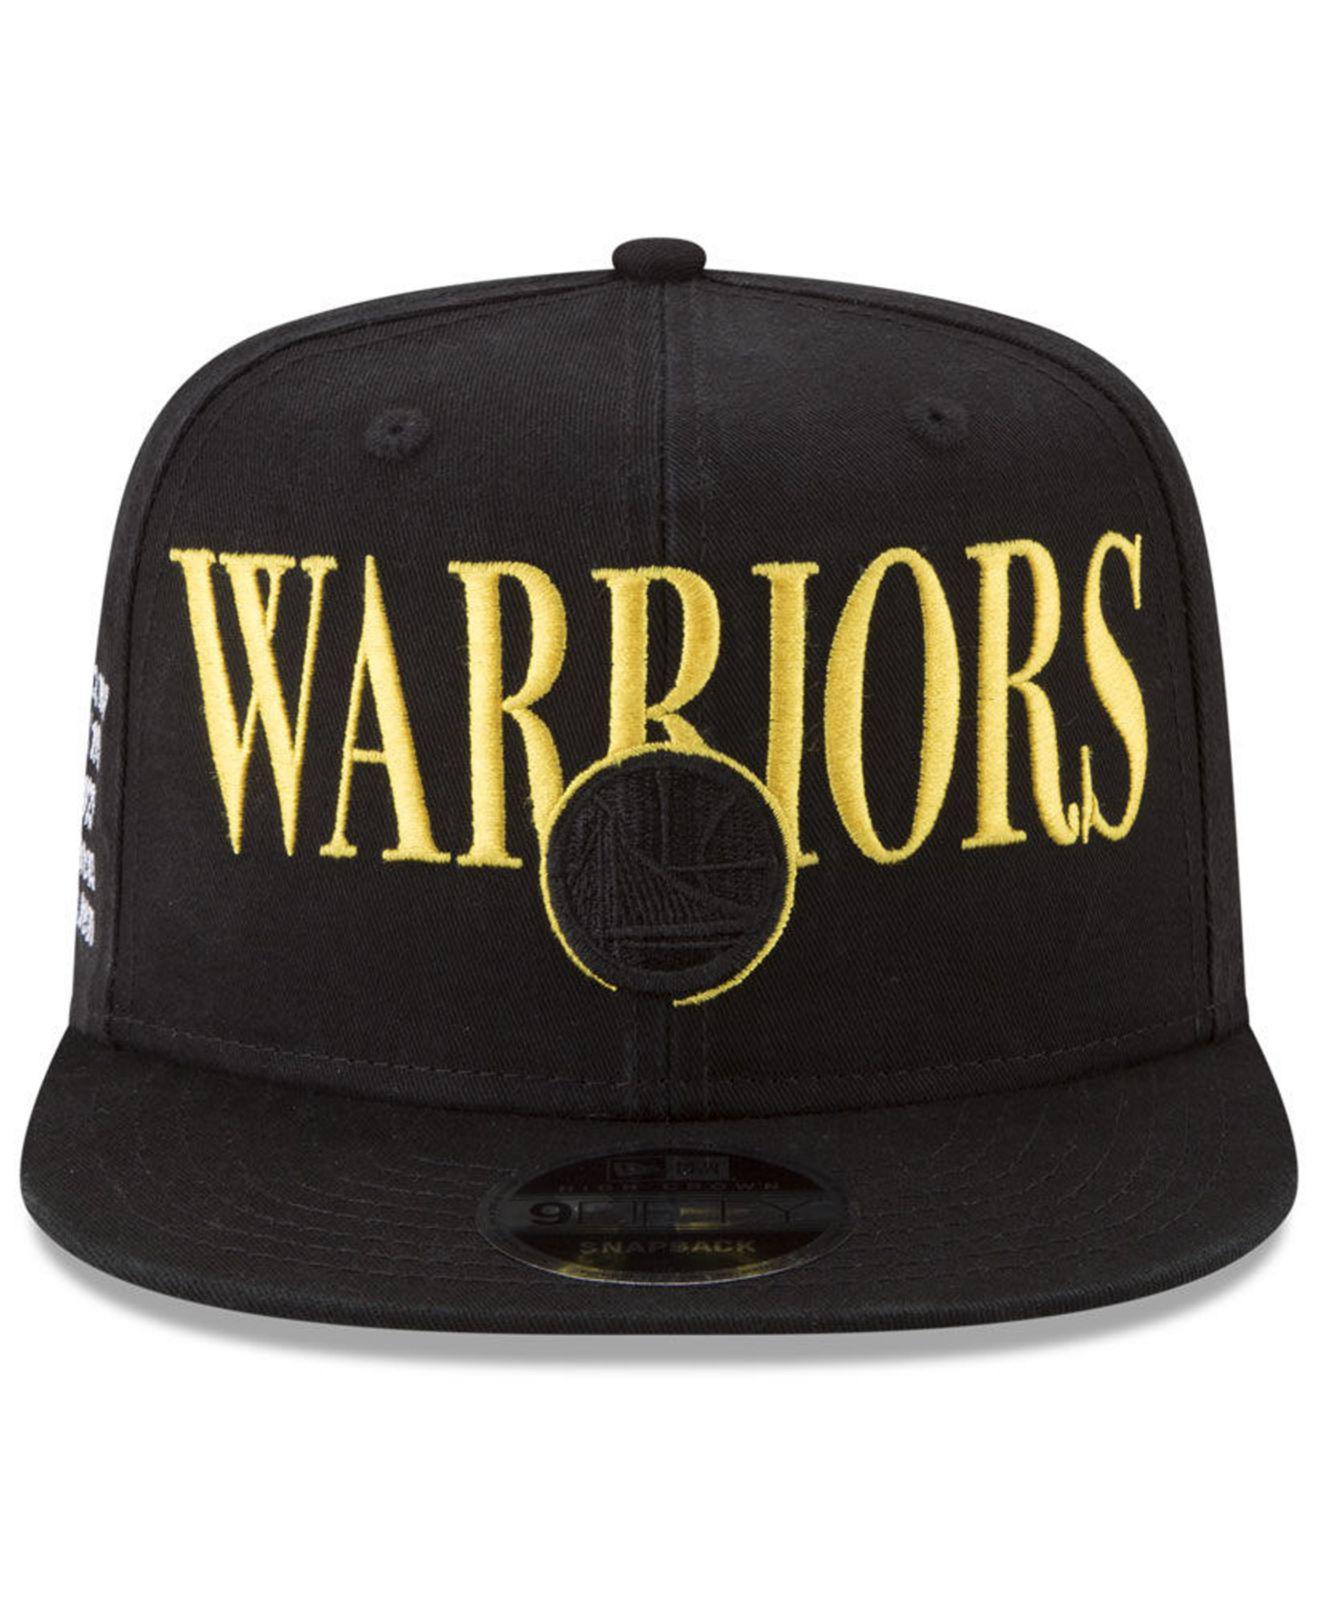 wholesale dealer 9ec27 797e2 ... good lyst ktz golden state warriors 90s throwback roadie 9fifty  snapback cap in black for men